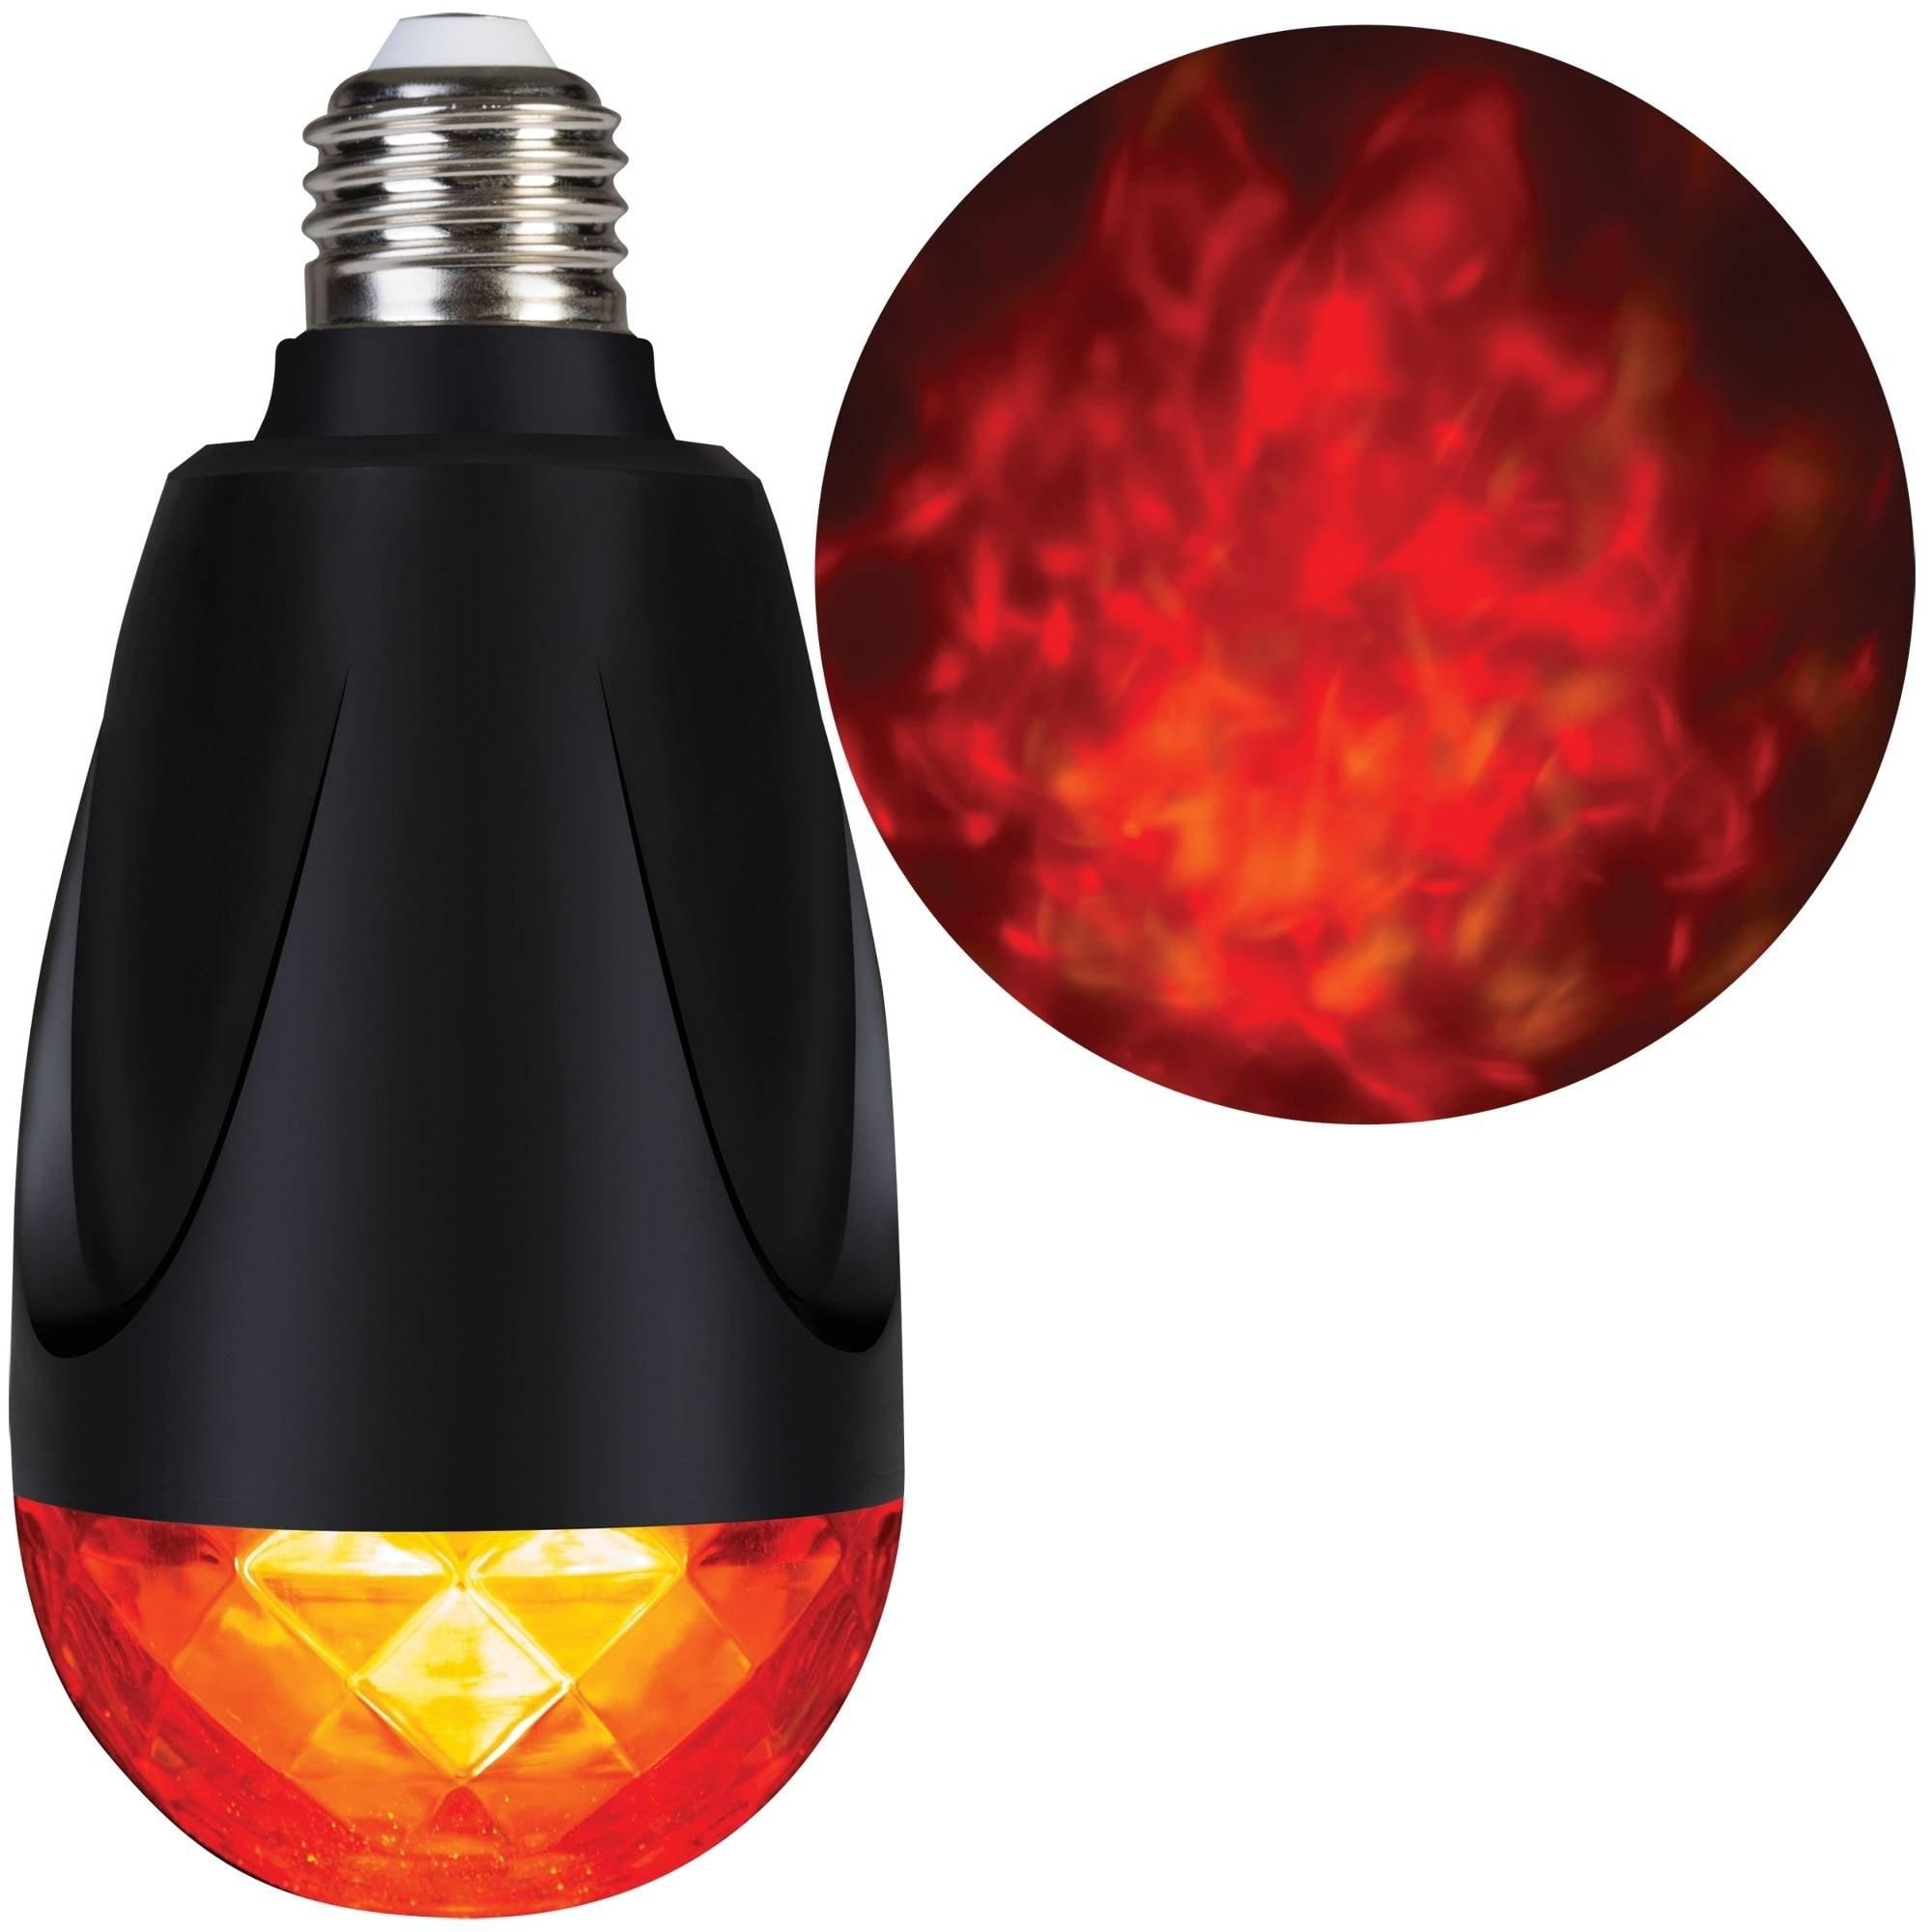 Generic Fire Ice Light Bulb Halloween Decoration